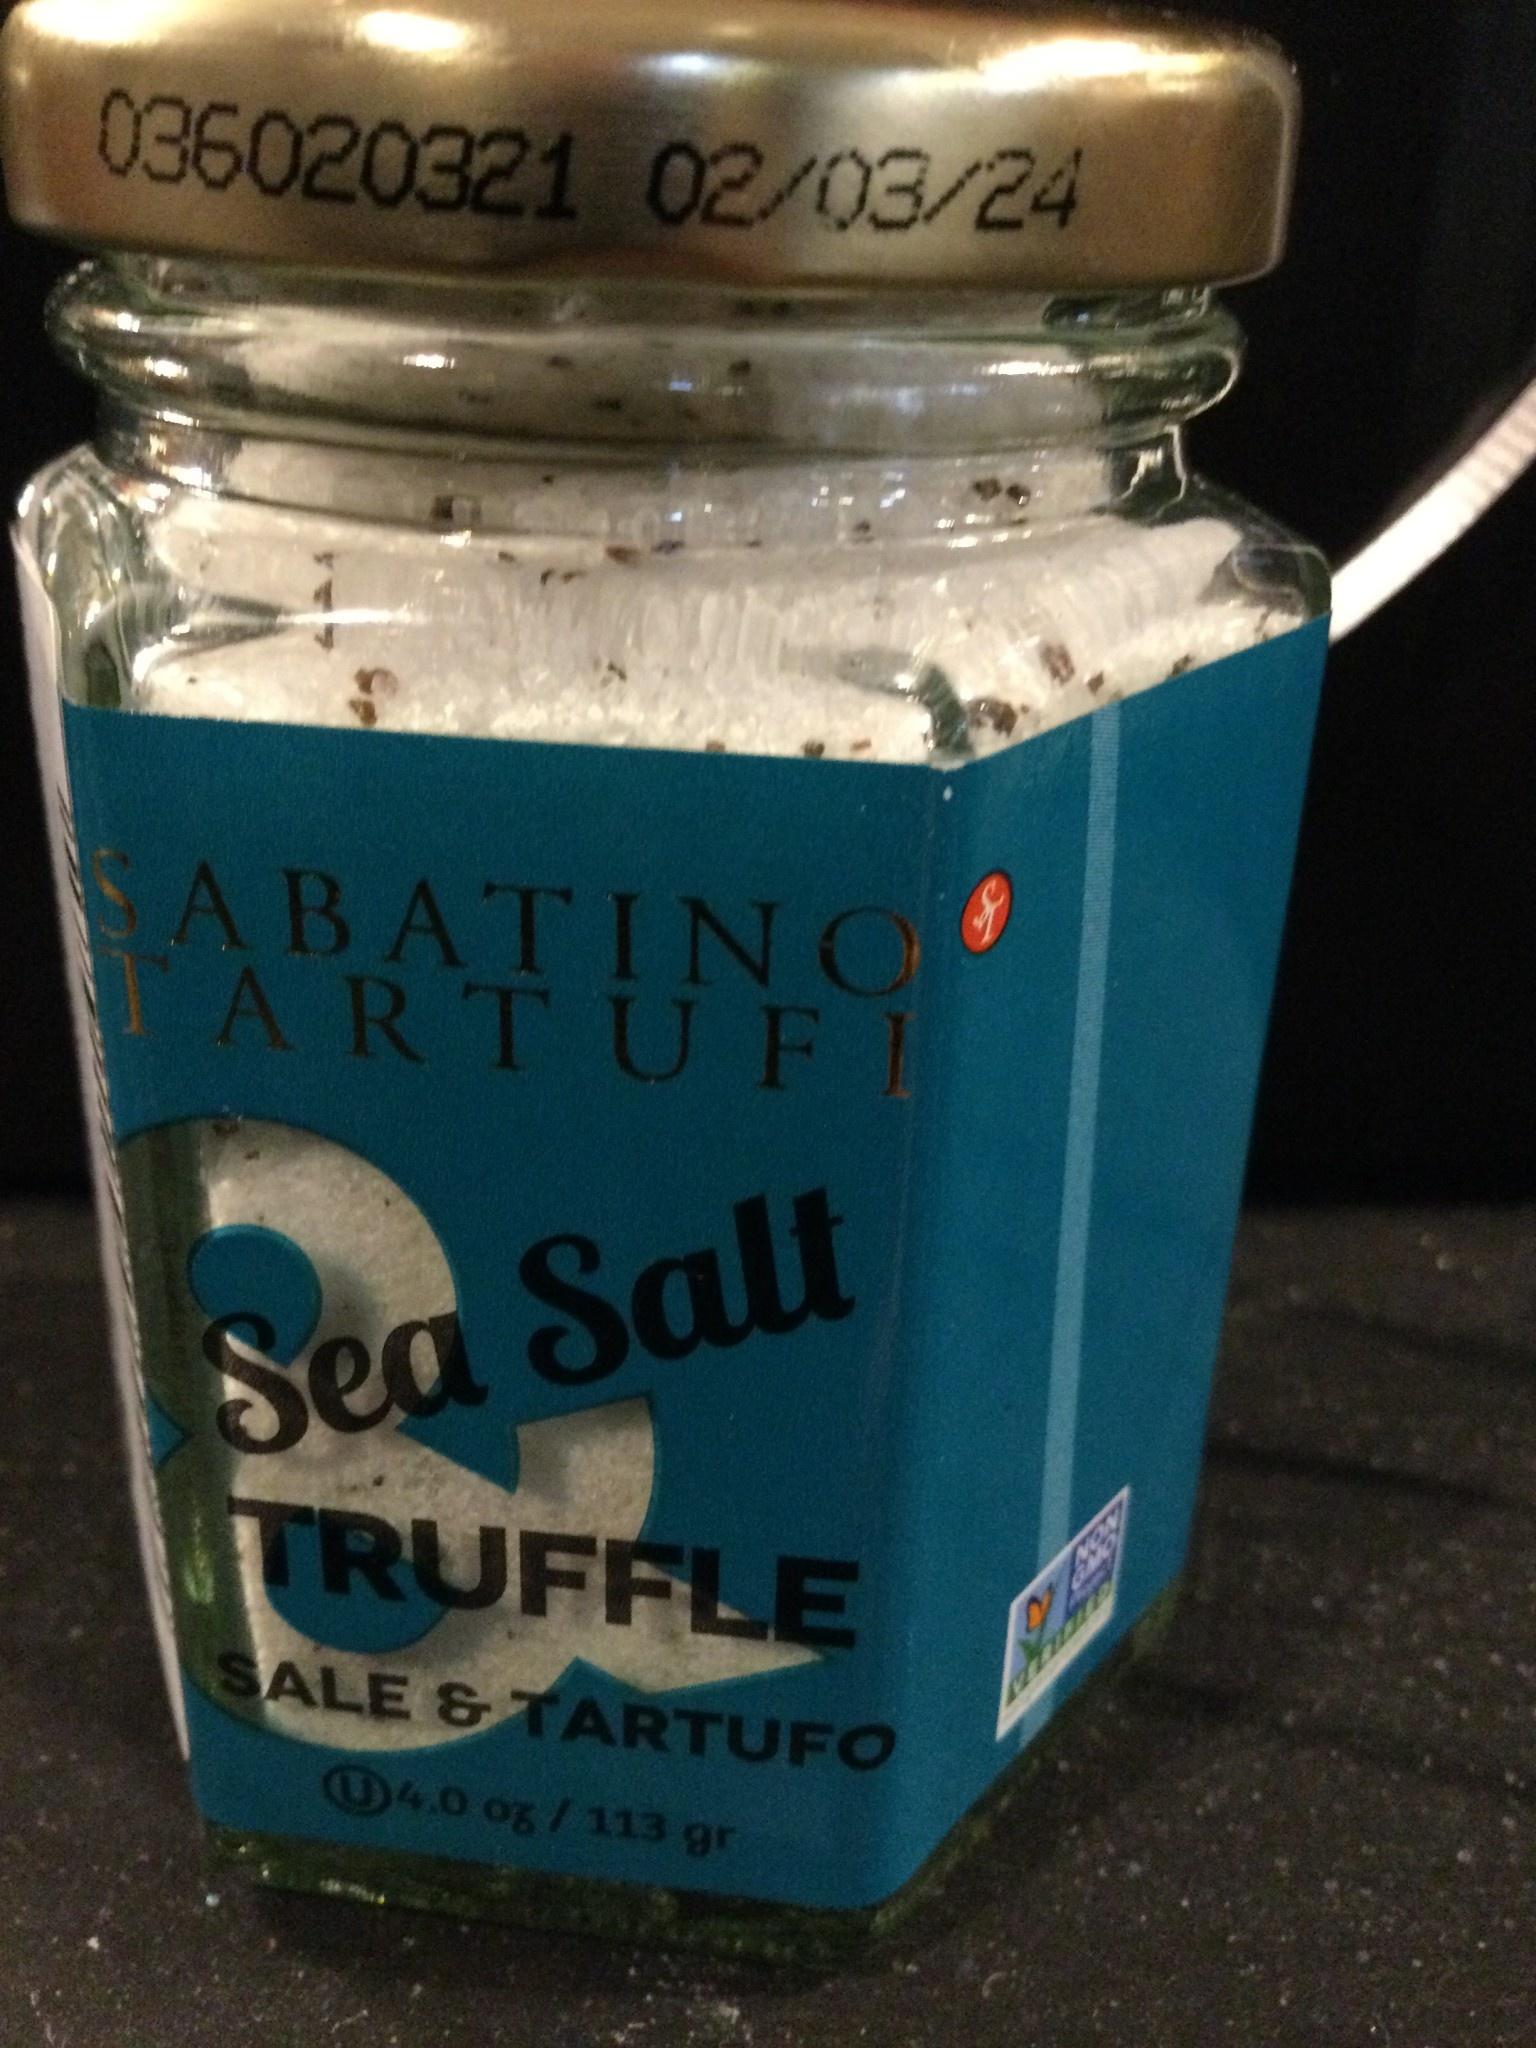 SABATINO TRUFFLE SALT